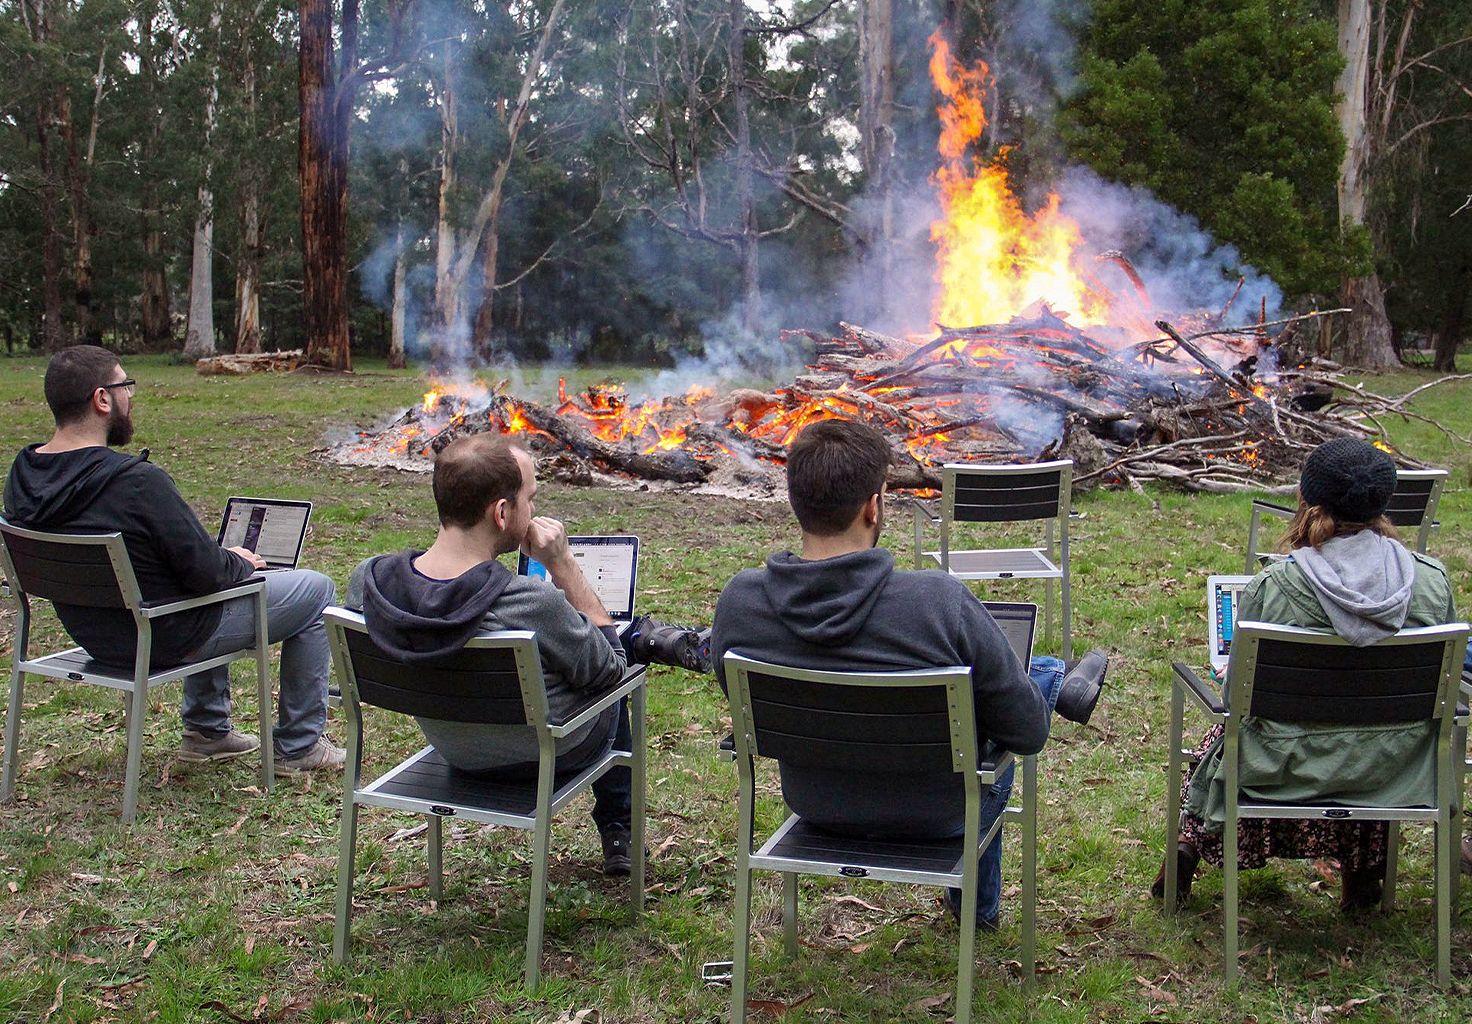 A photo of some members of the Cliniko team stood around a bonfire.